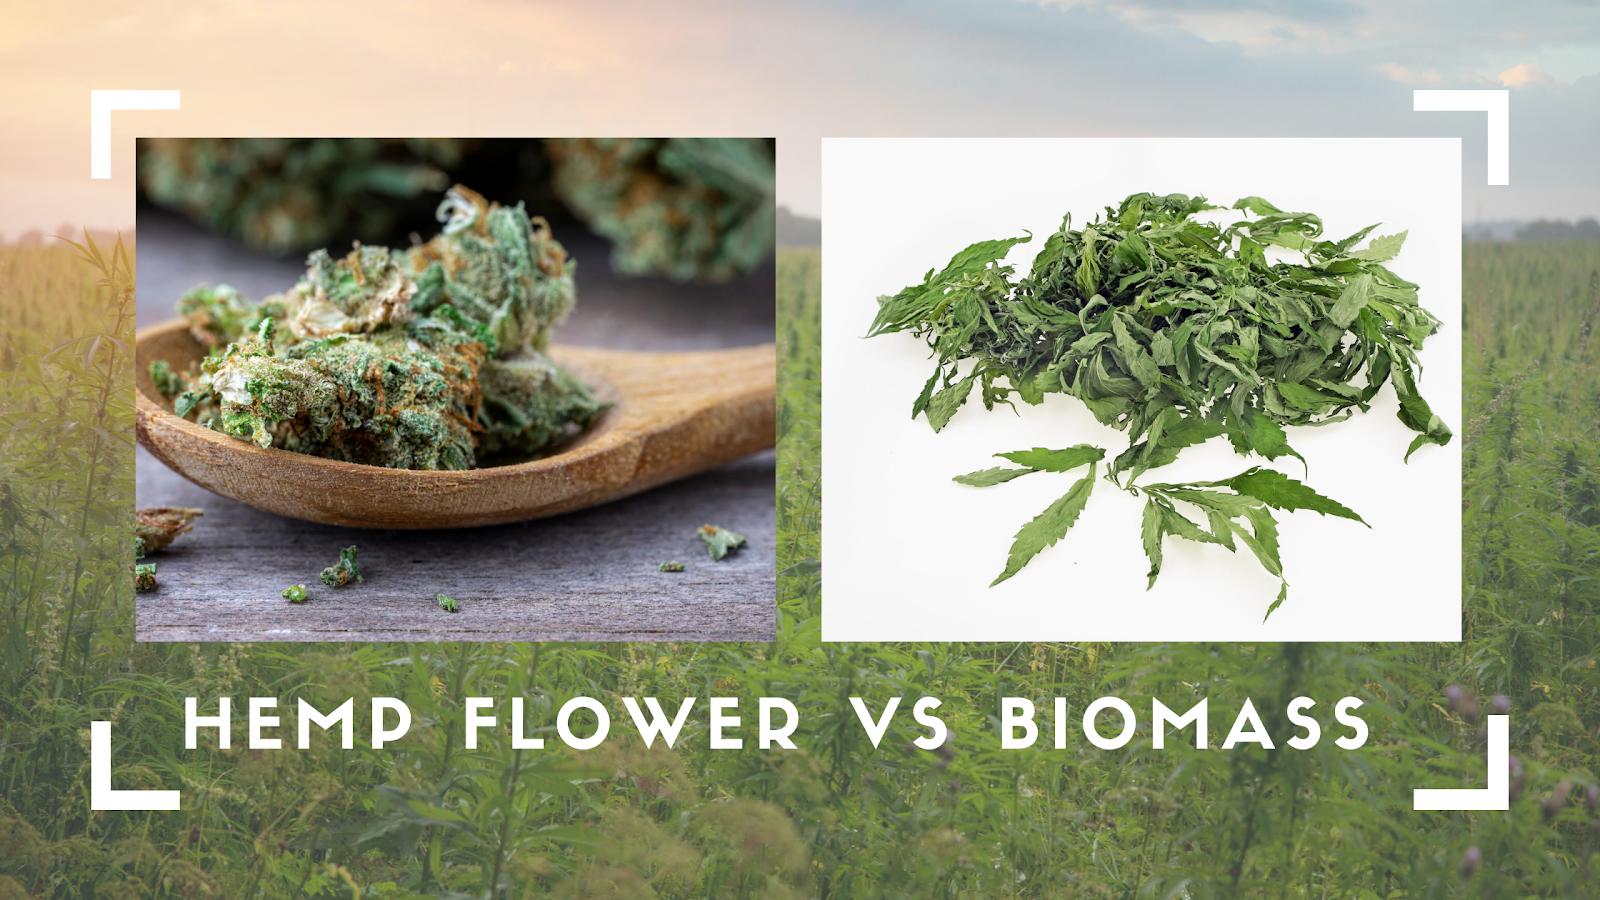 Hemp Flower vs Biomass